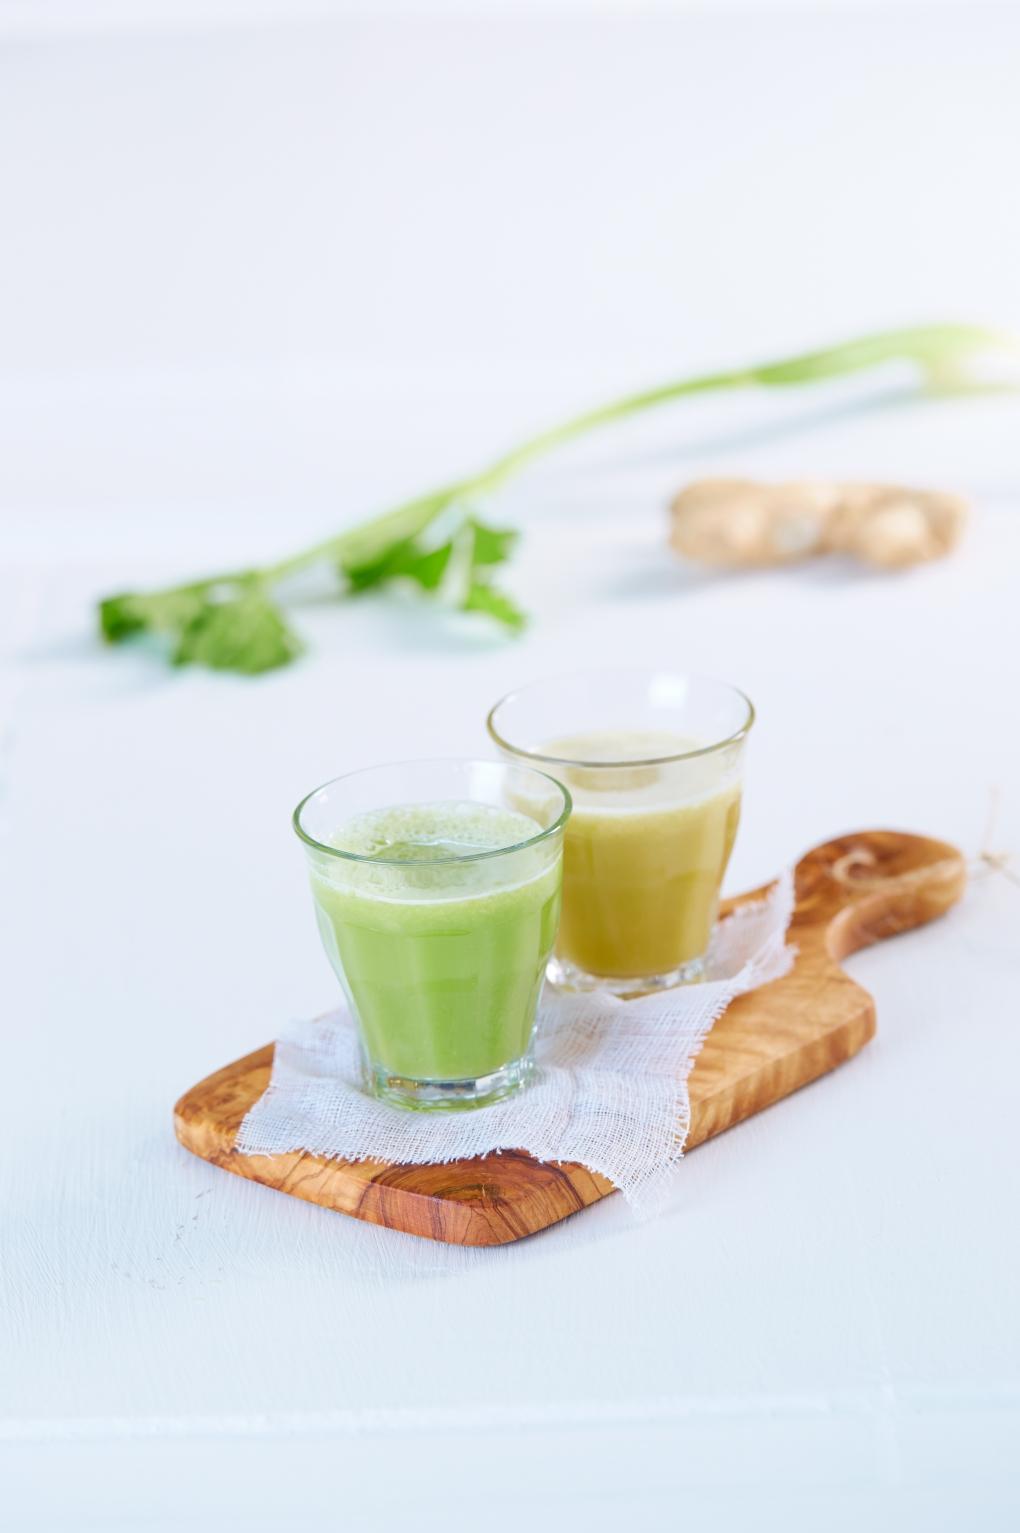 1-Ingefaer og elektrolytt shot-eple,ingefaer,selleri,agurk